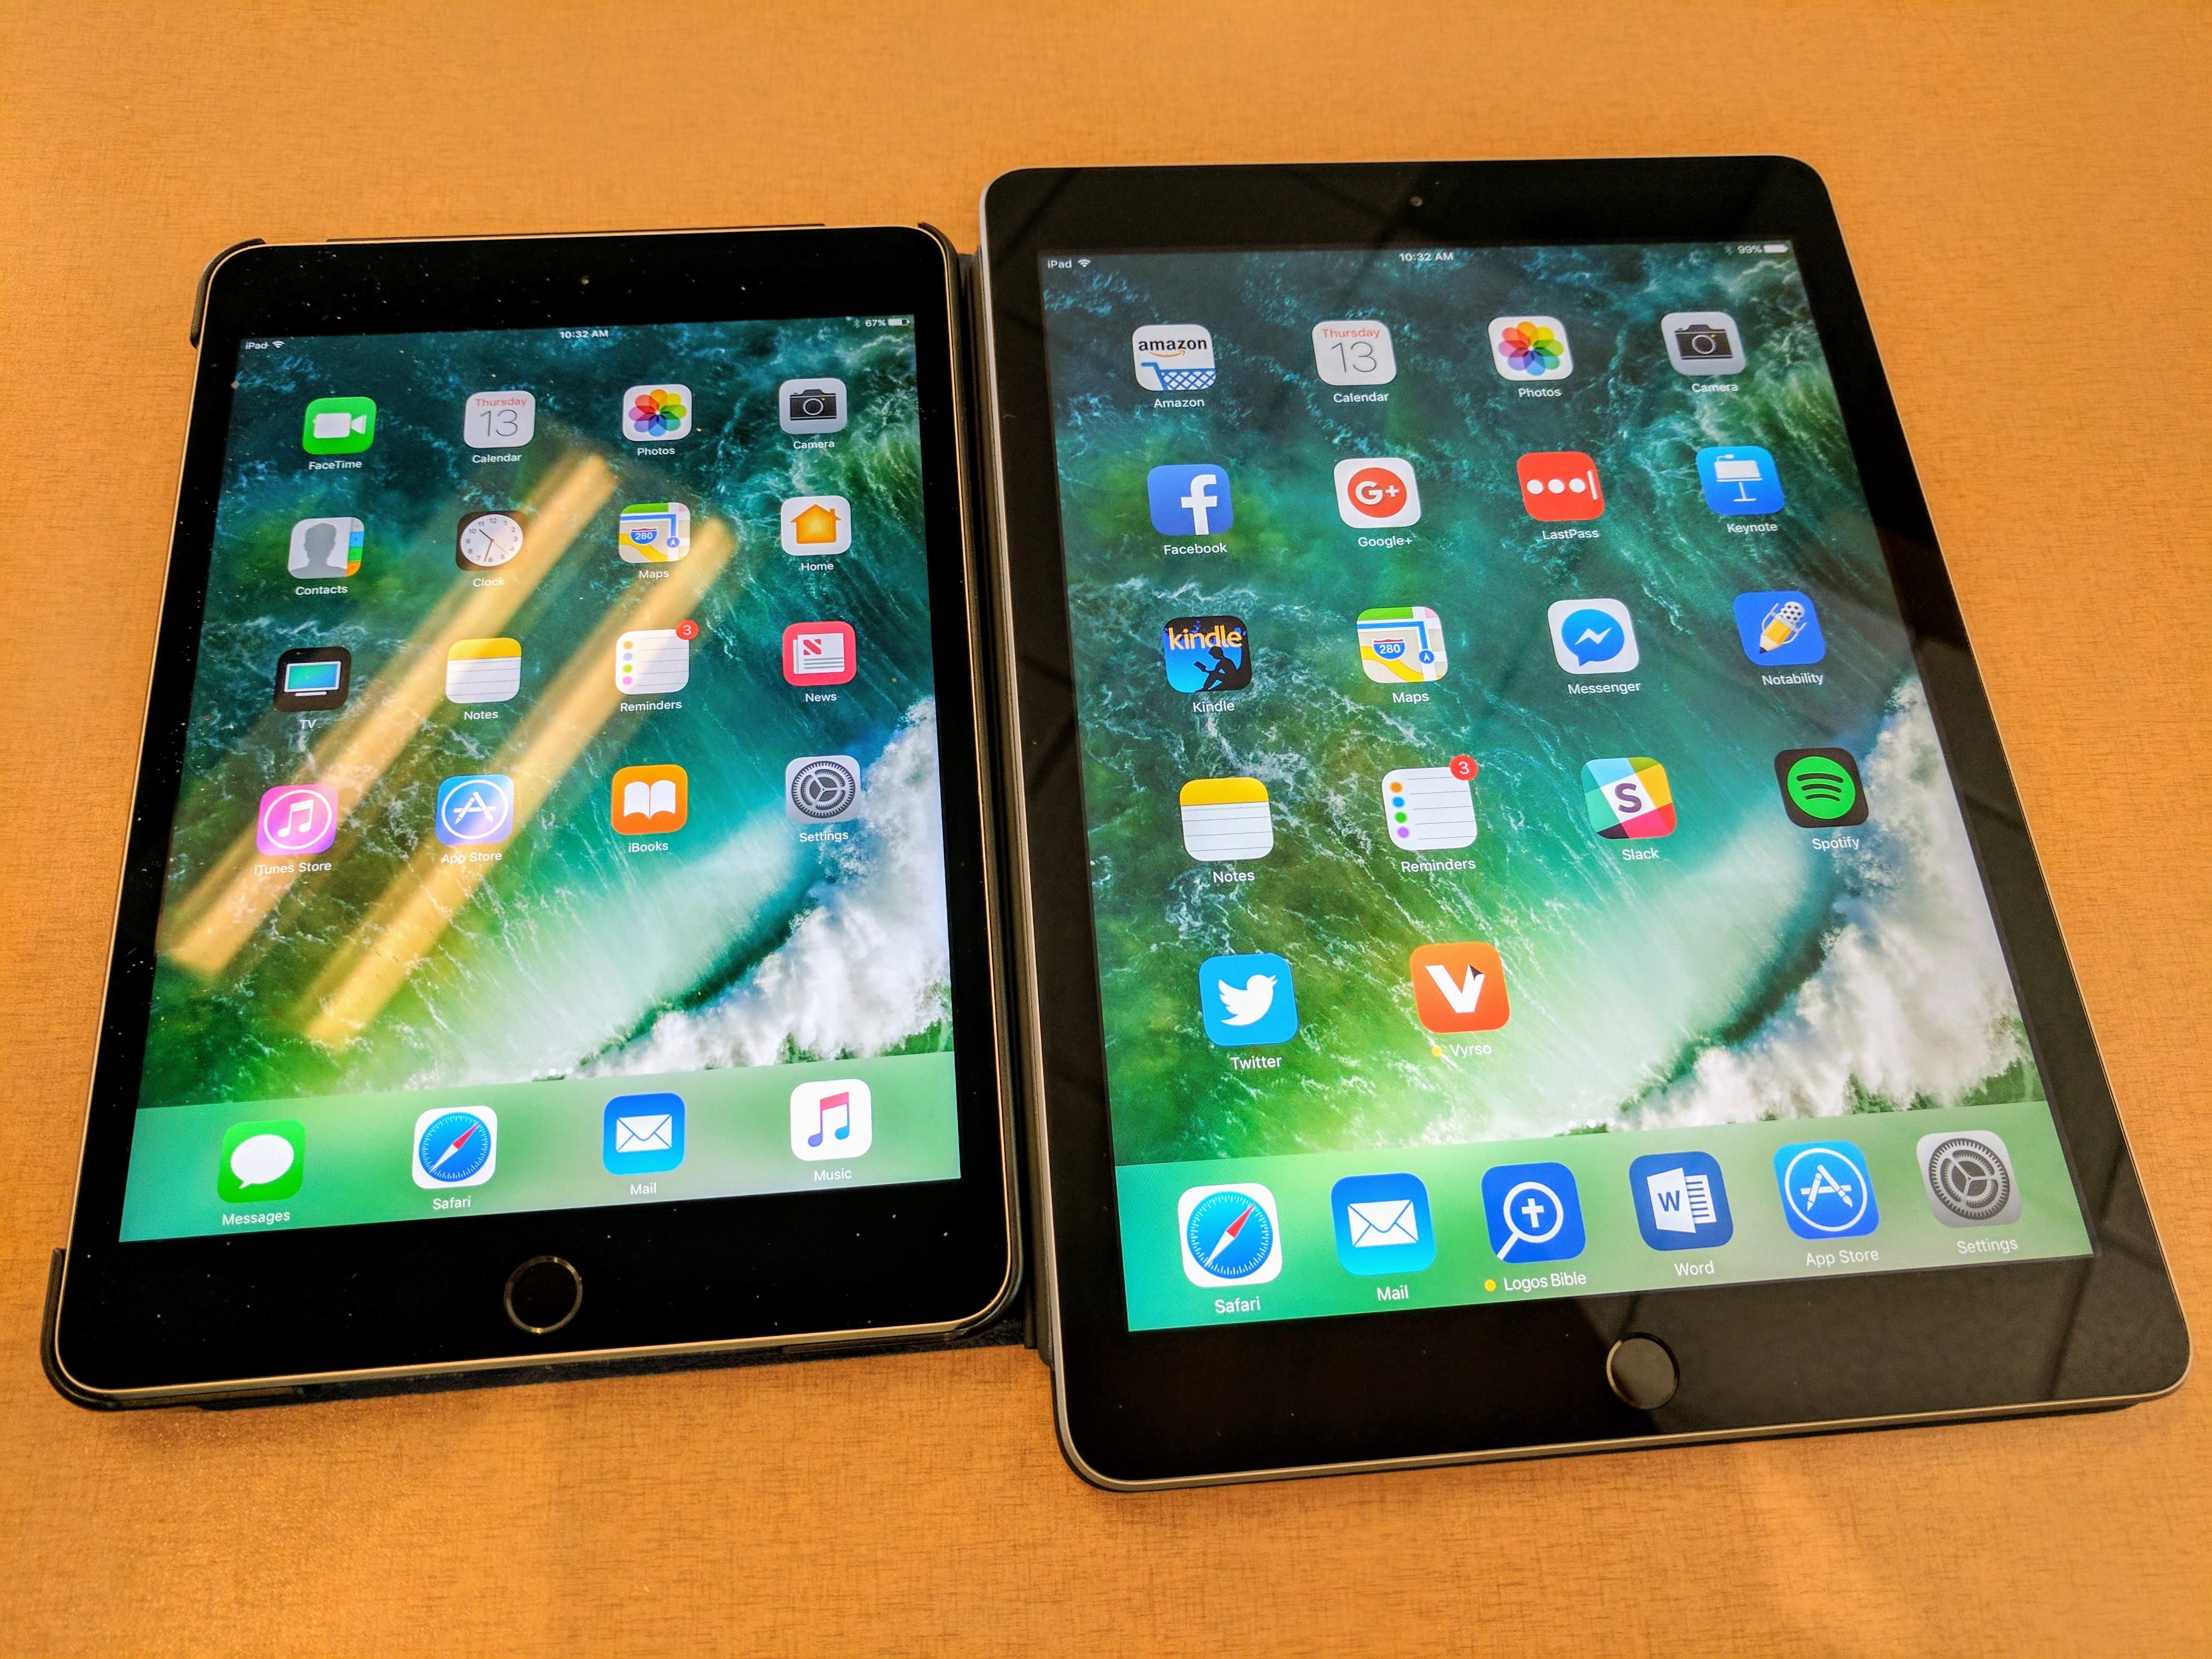 ipad mini 4 v 2017 9.7-inch ipad